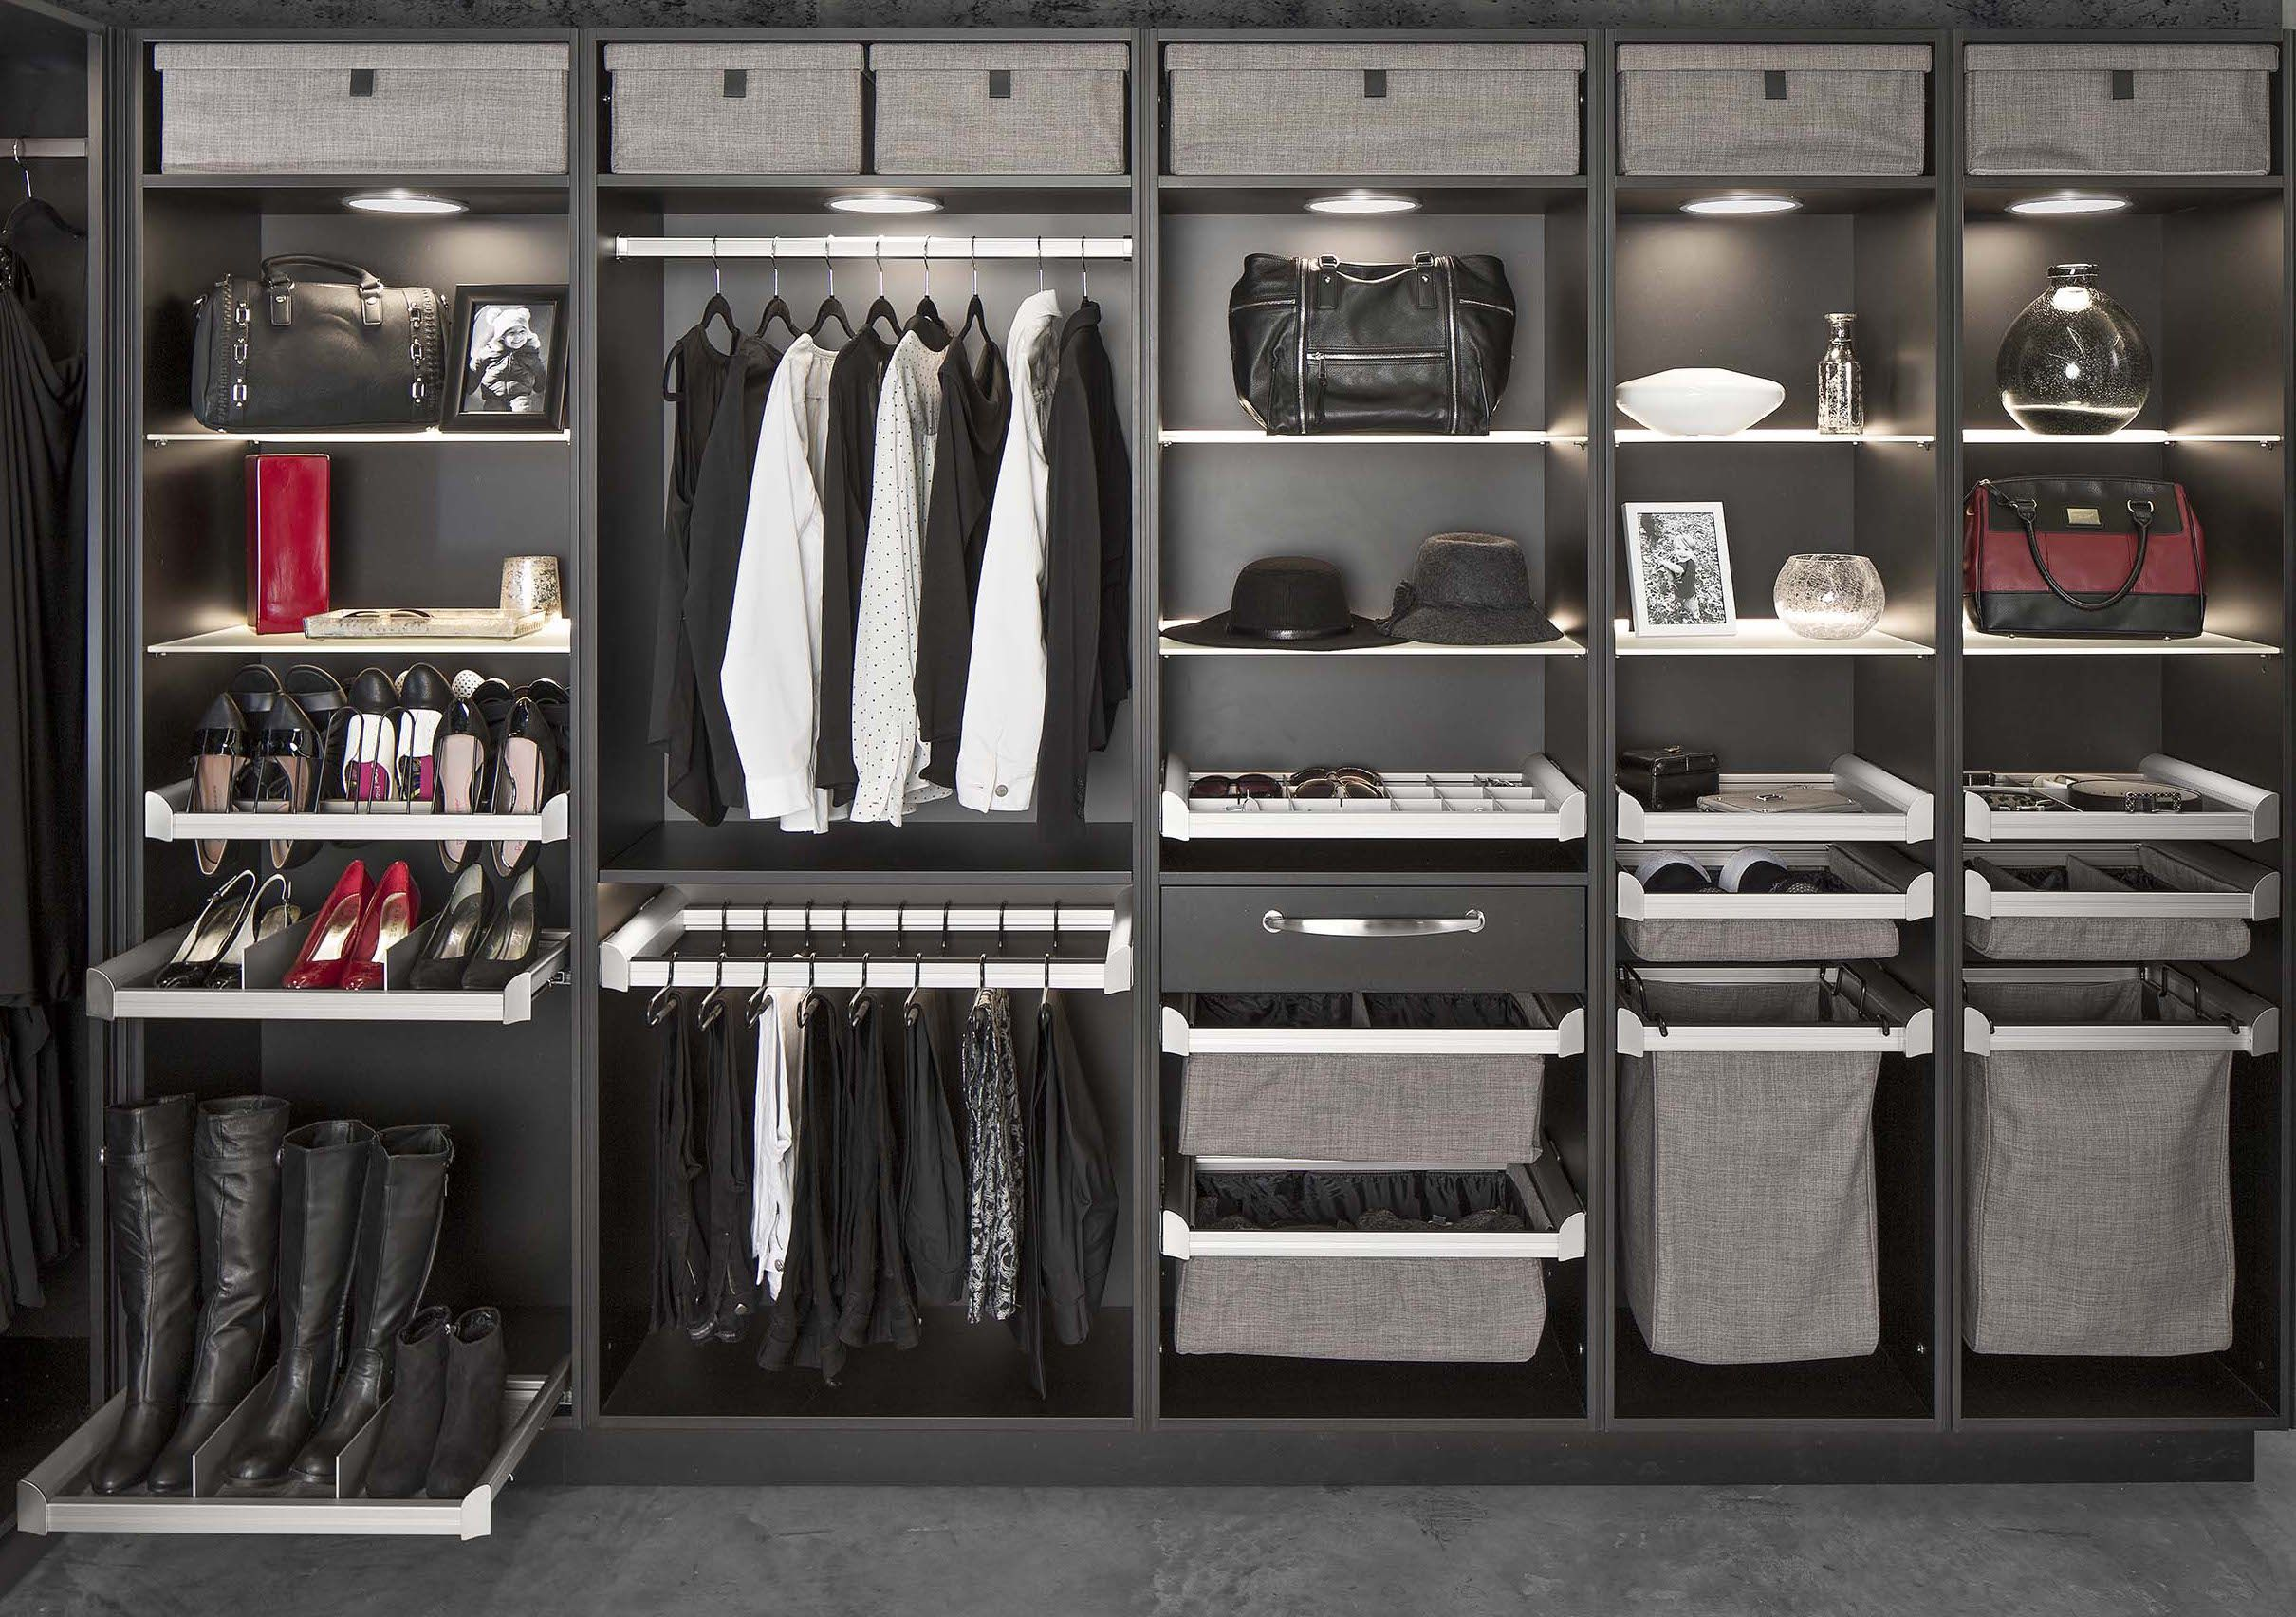 Hafele Closet I Really Like How Clean This Looks Hafele Smart Closet Closet Storage Systems